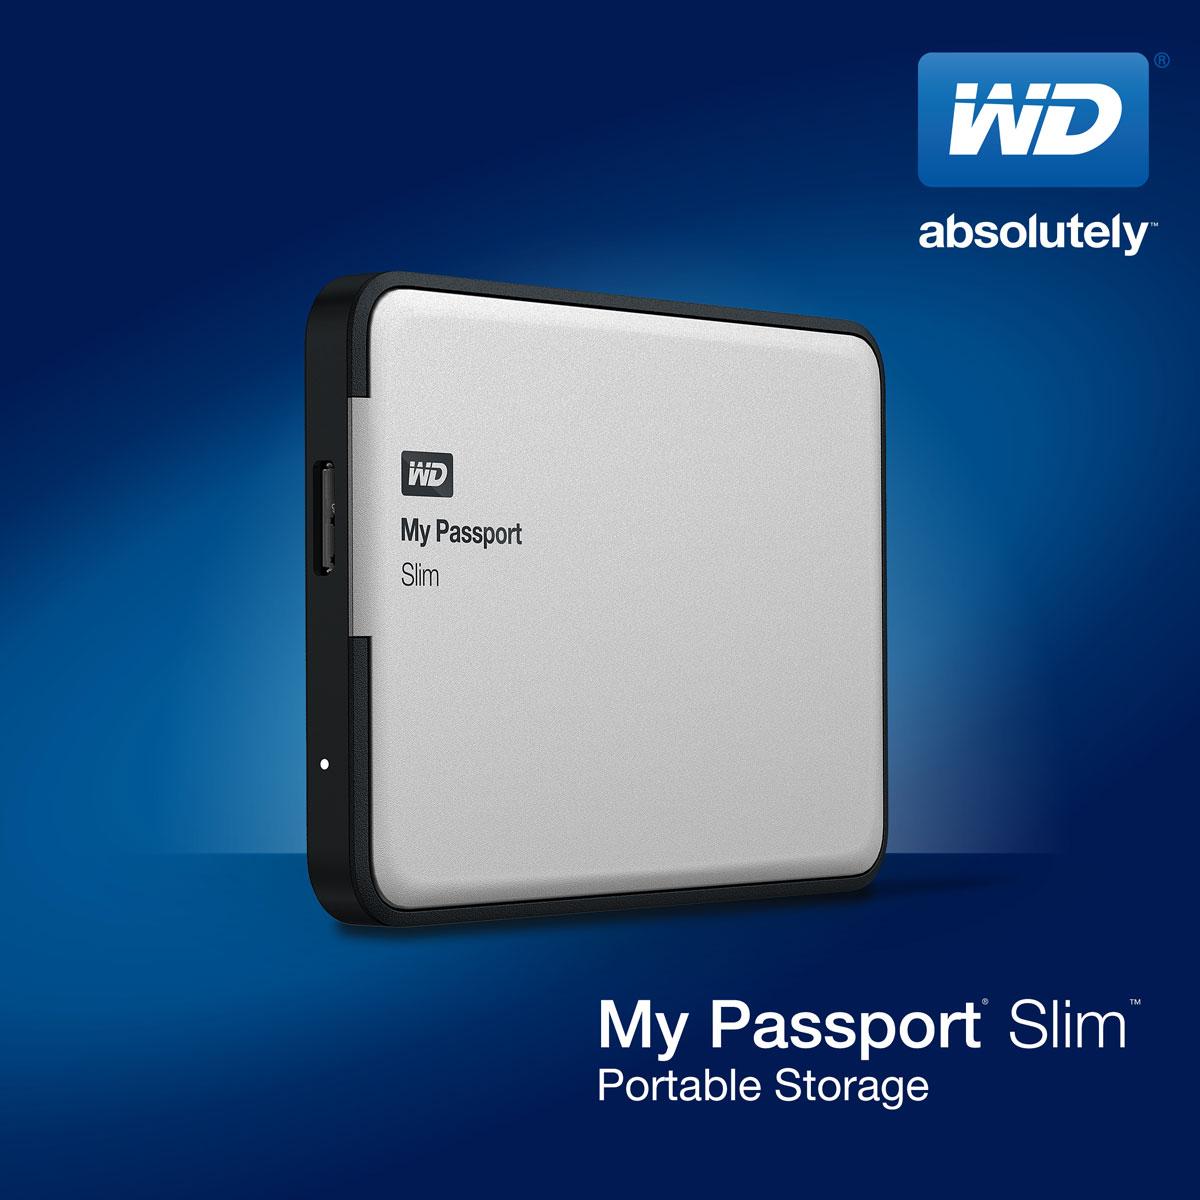 WD-My-Passport-Slim-PR-2